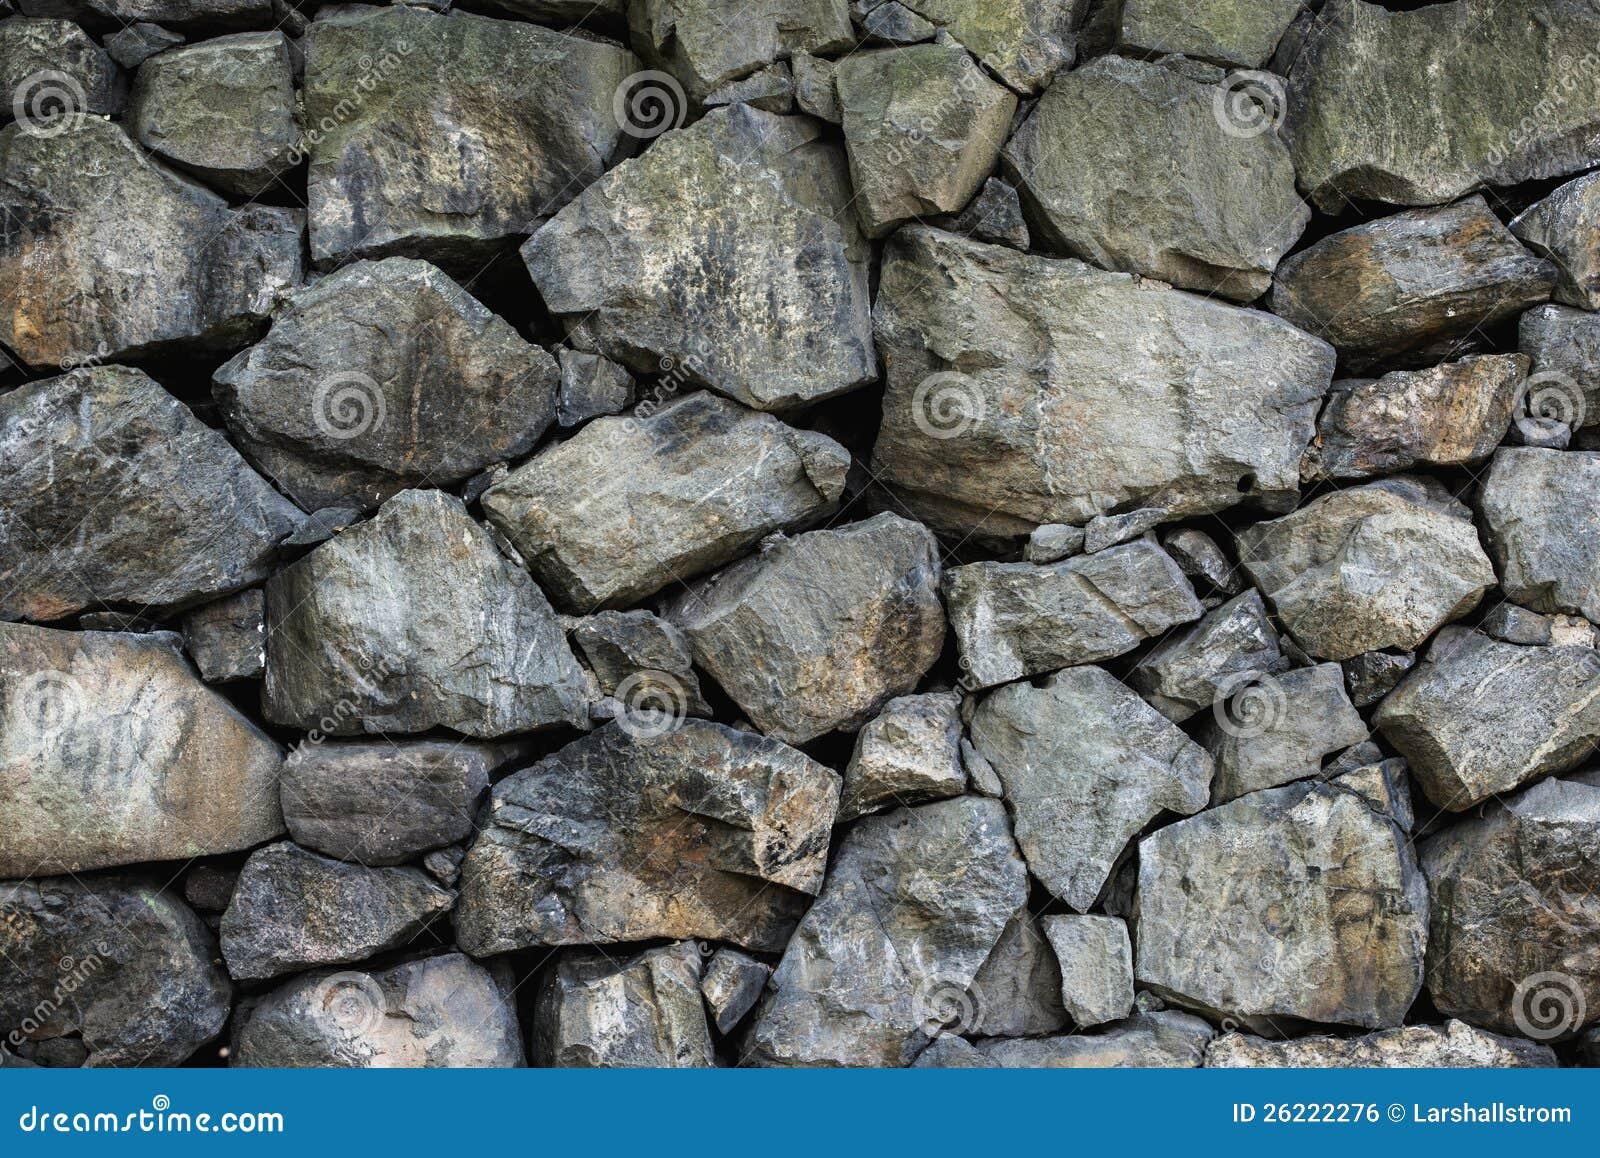 Rough Granite Block : Wall of rough stone blocks stock photo image built